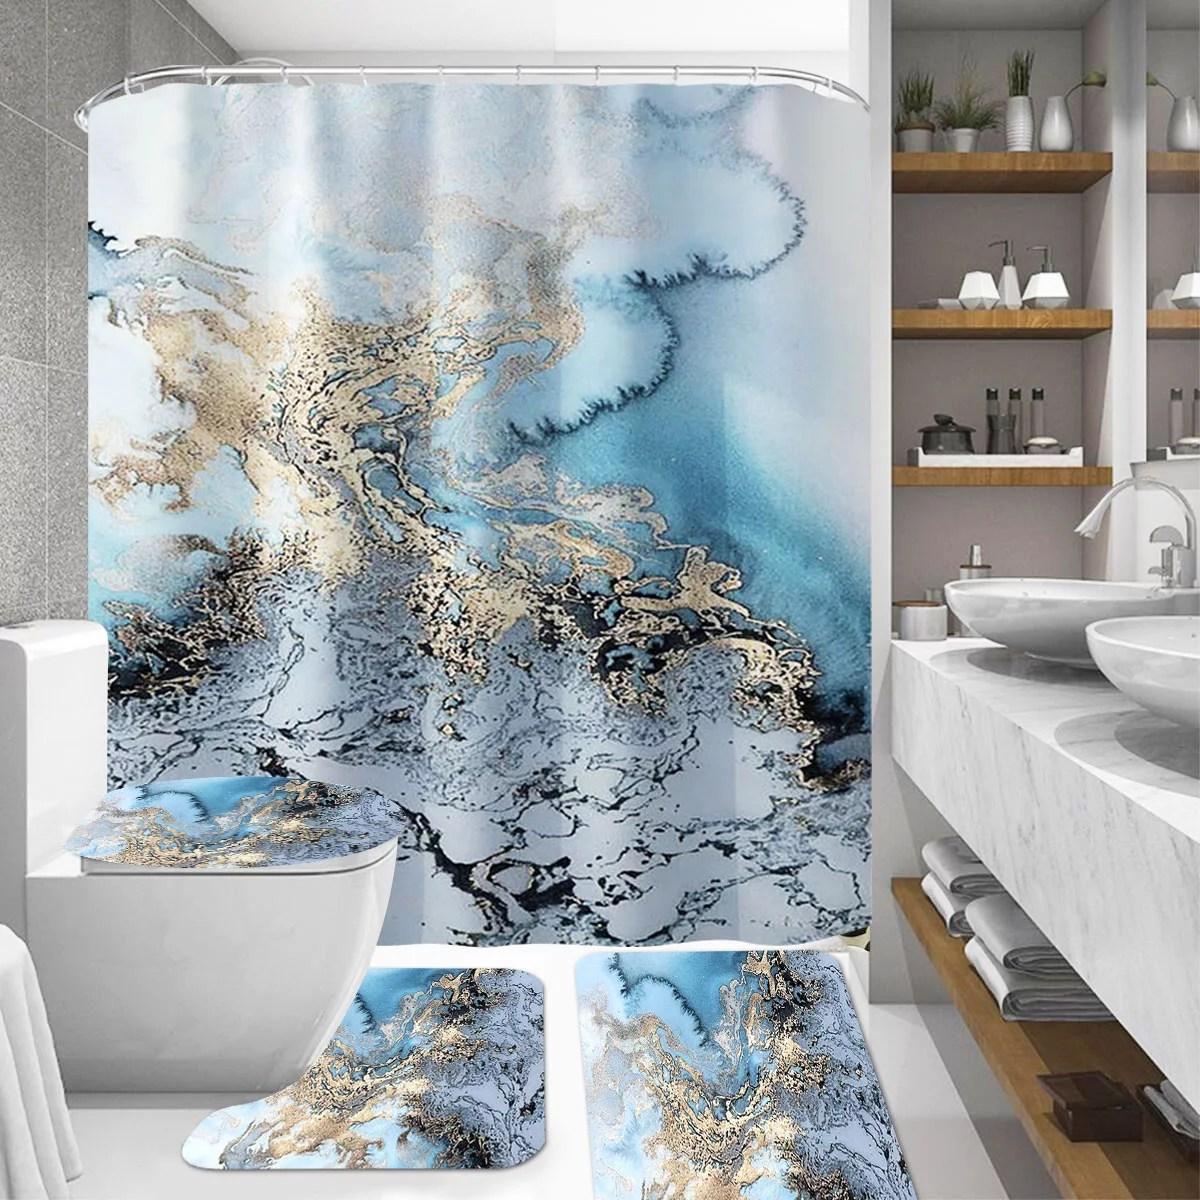 4pcs shower curtain set bathroom decor morden style bright luxury concise include shower curtain non slip base pad lid toilet cover mat bathroom mat